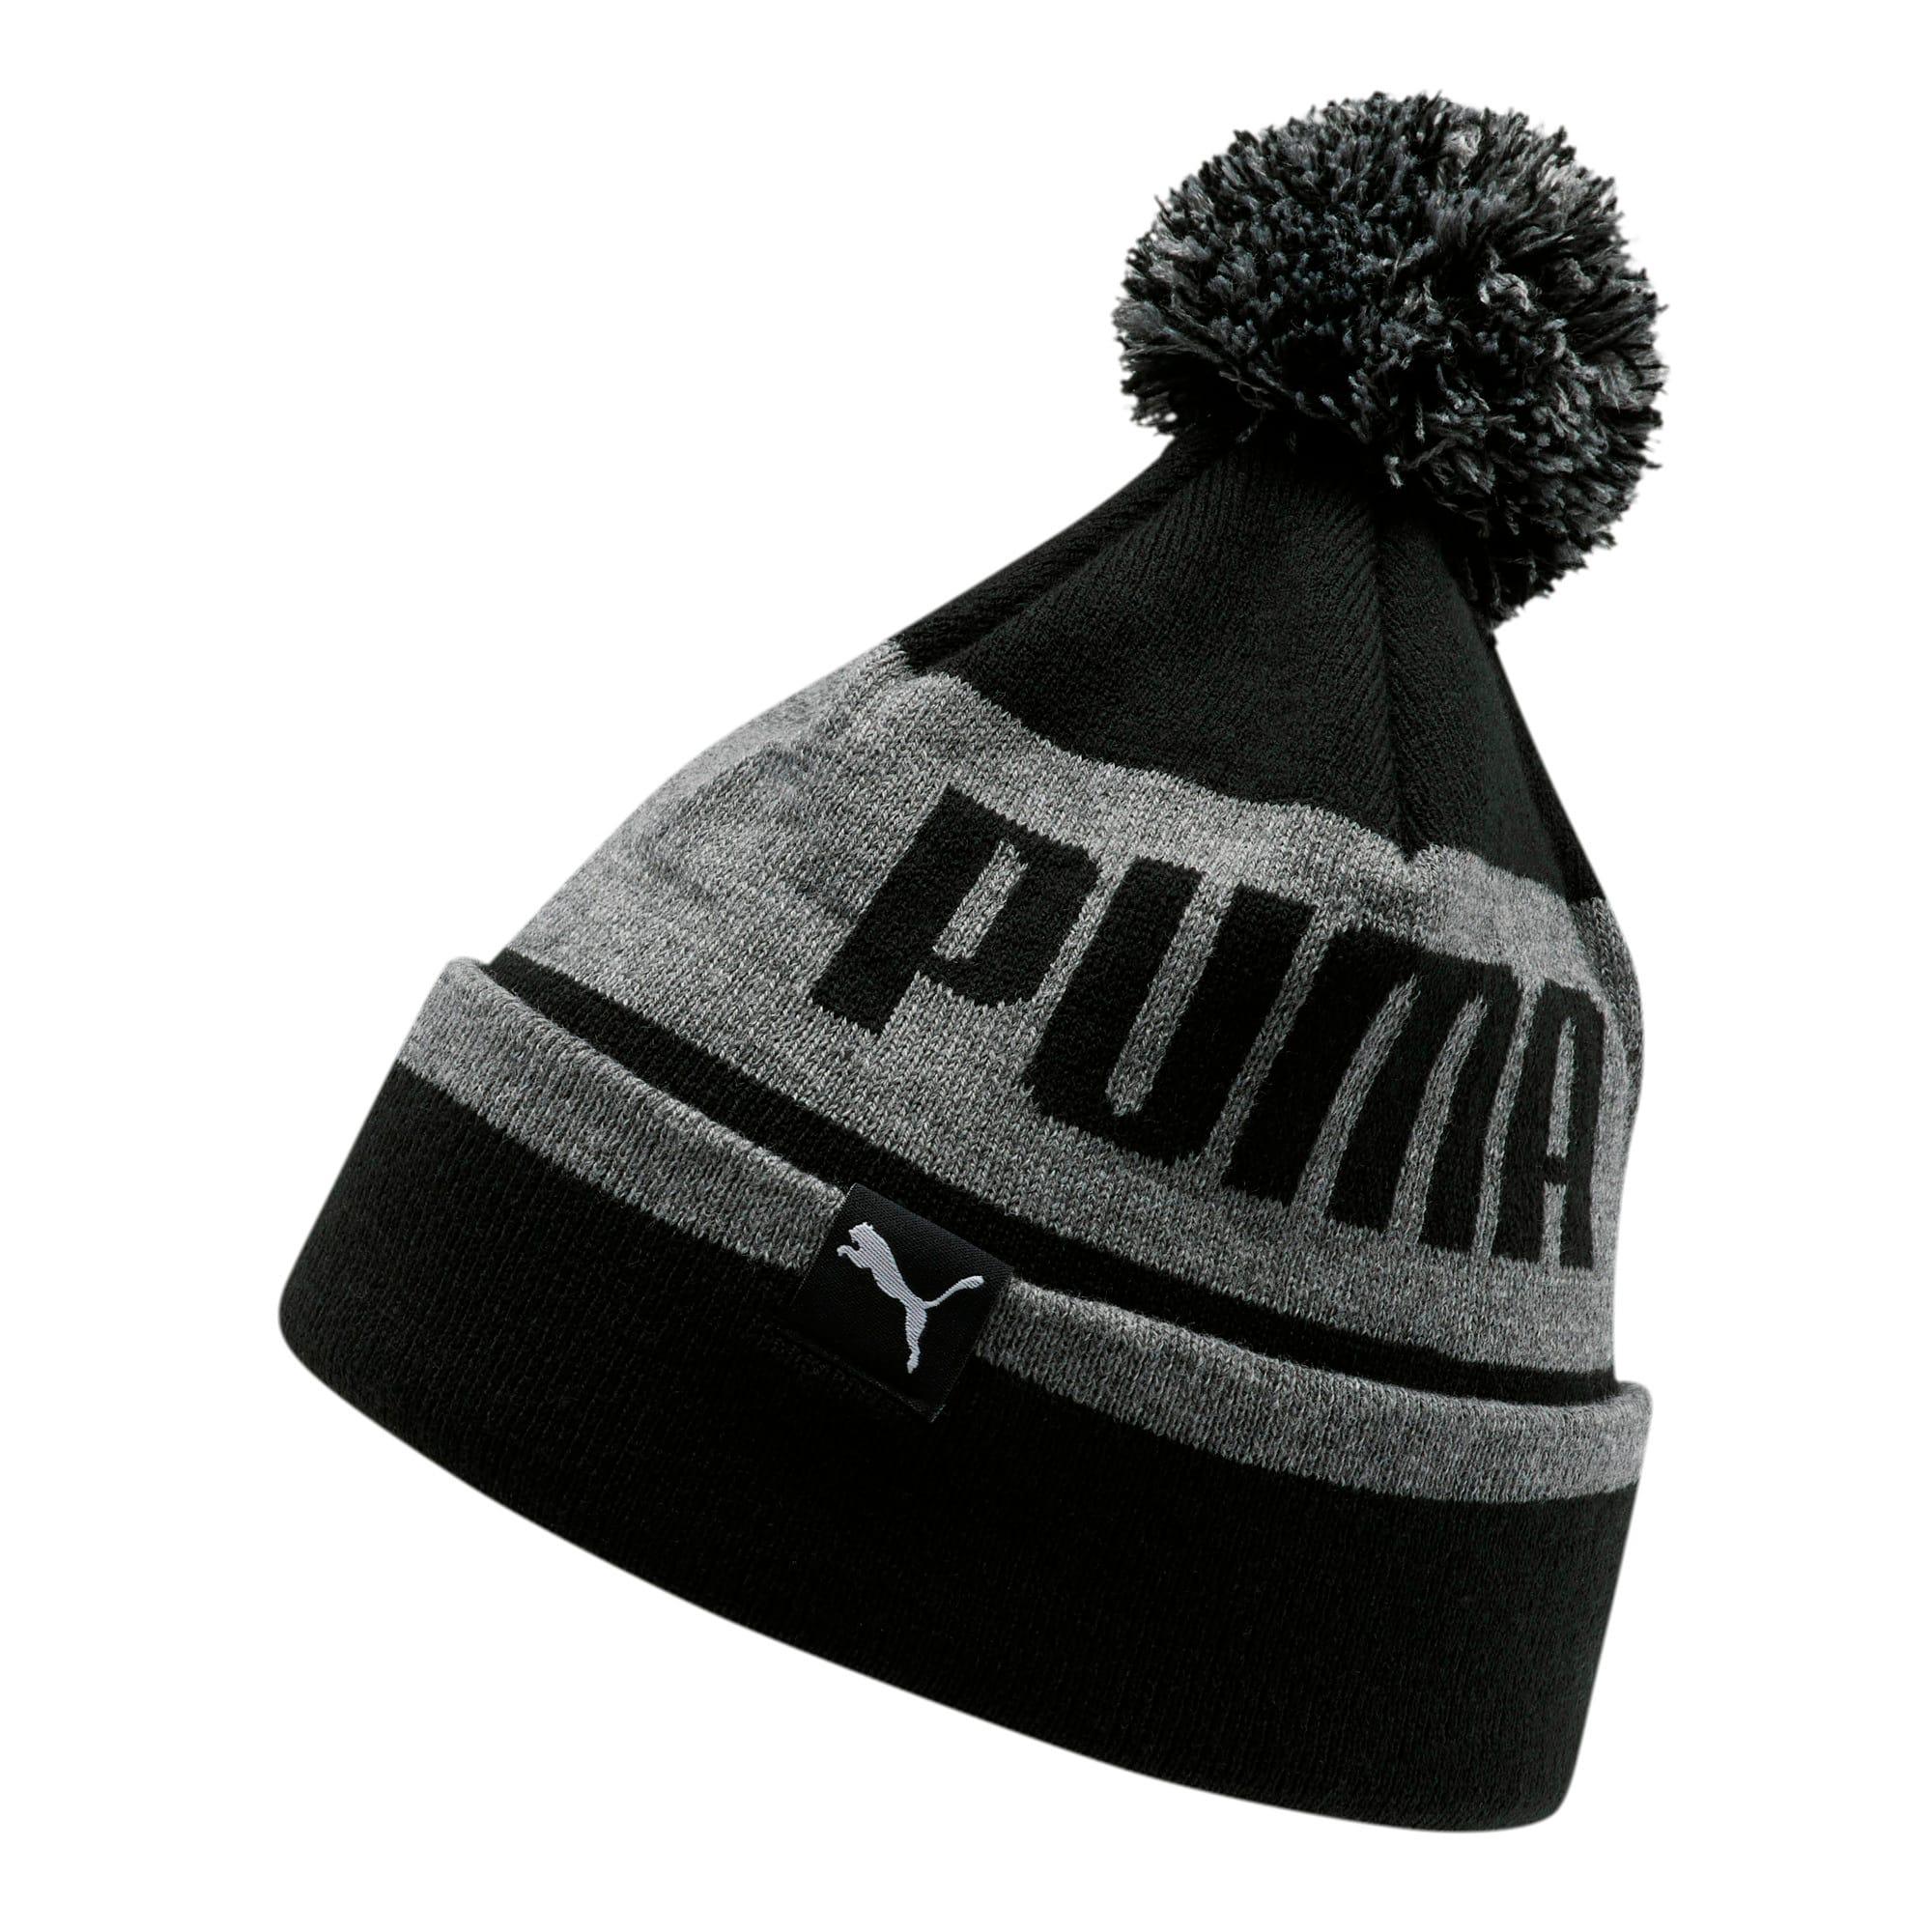 Thumbnail 1 of PUMA Block Cuff Pom Men's Beanie, Grey/Black, medium